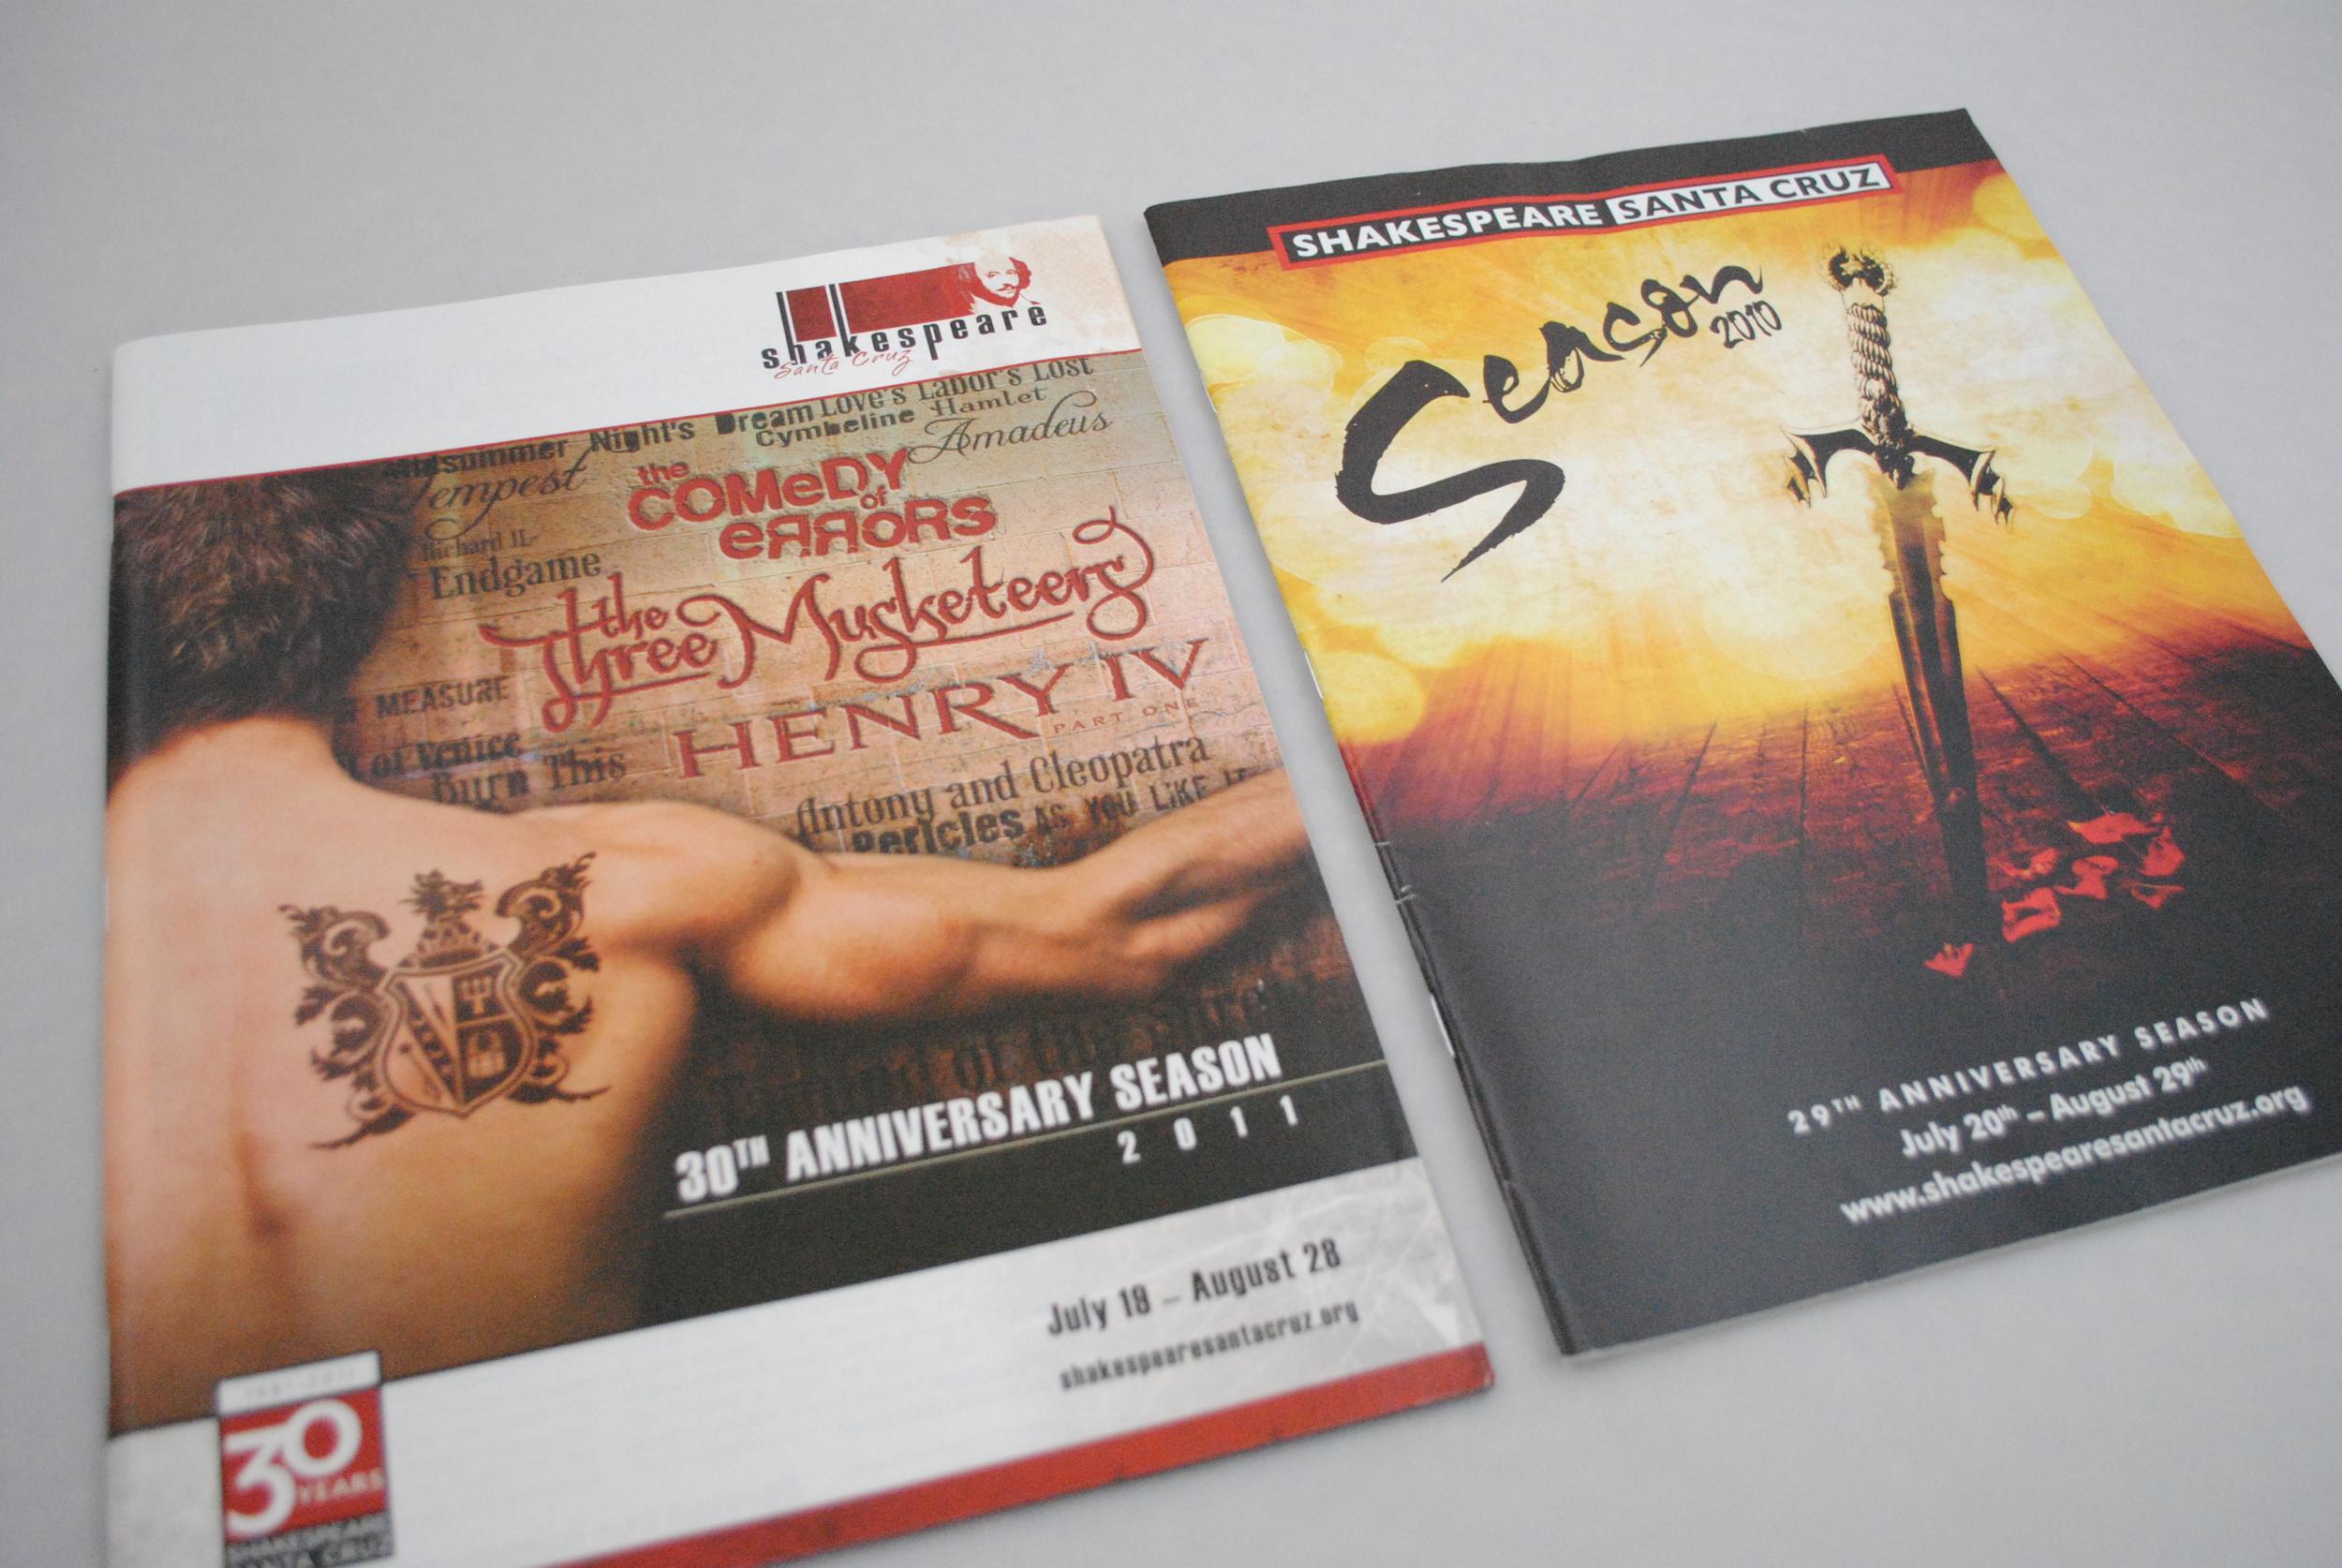 Shakespeare Santa Cruz Seasons